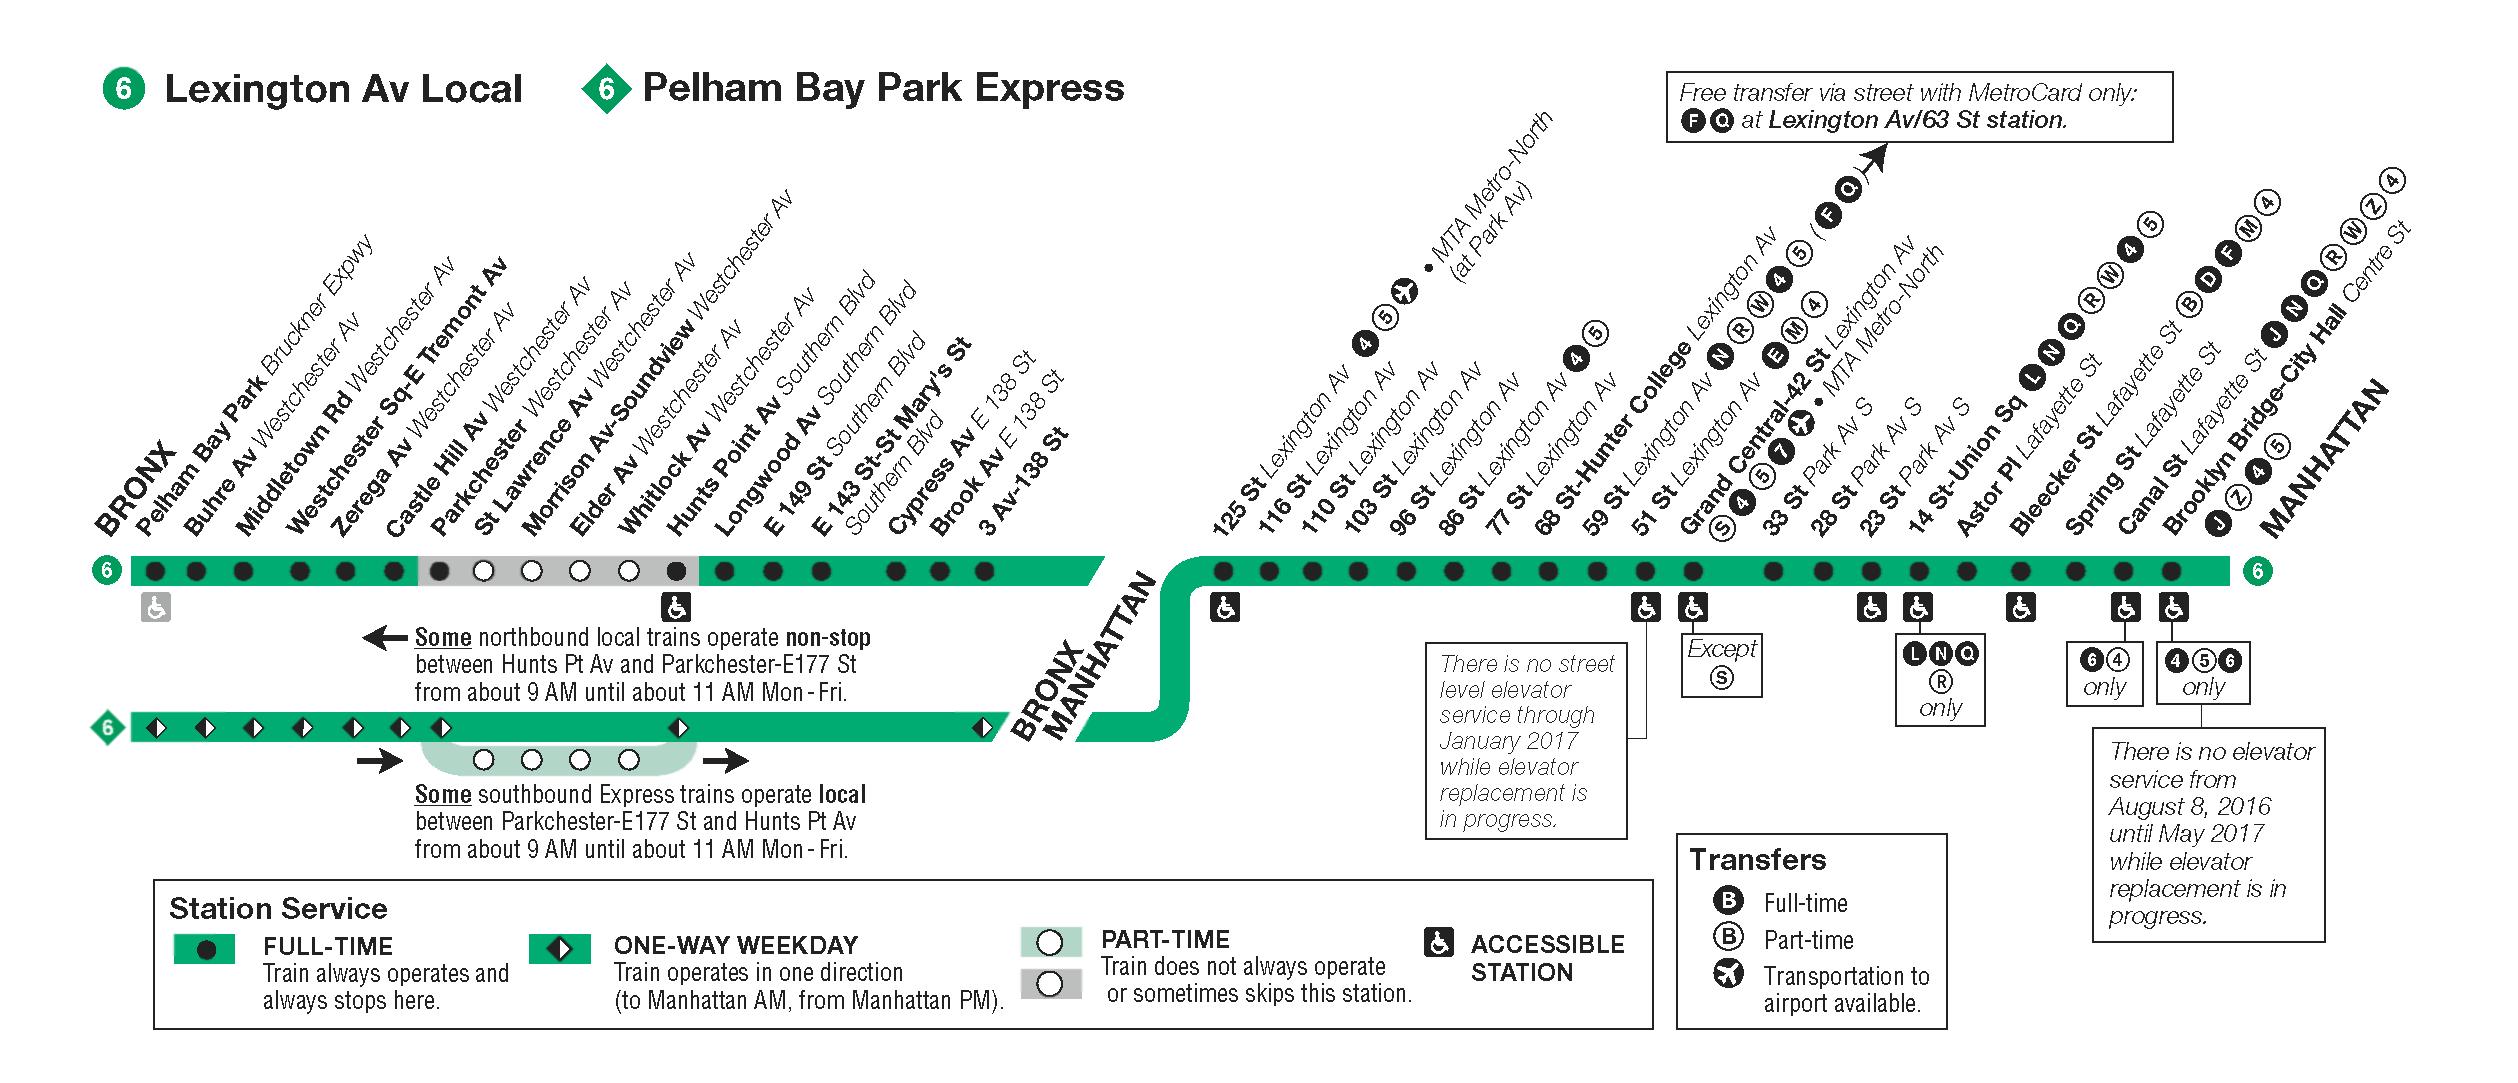 nyc-metro-route-6-lexington-avenue-local-map